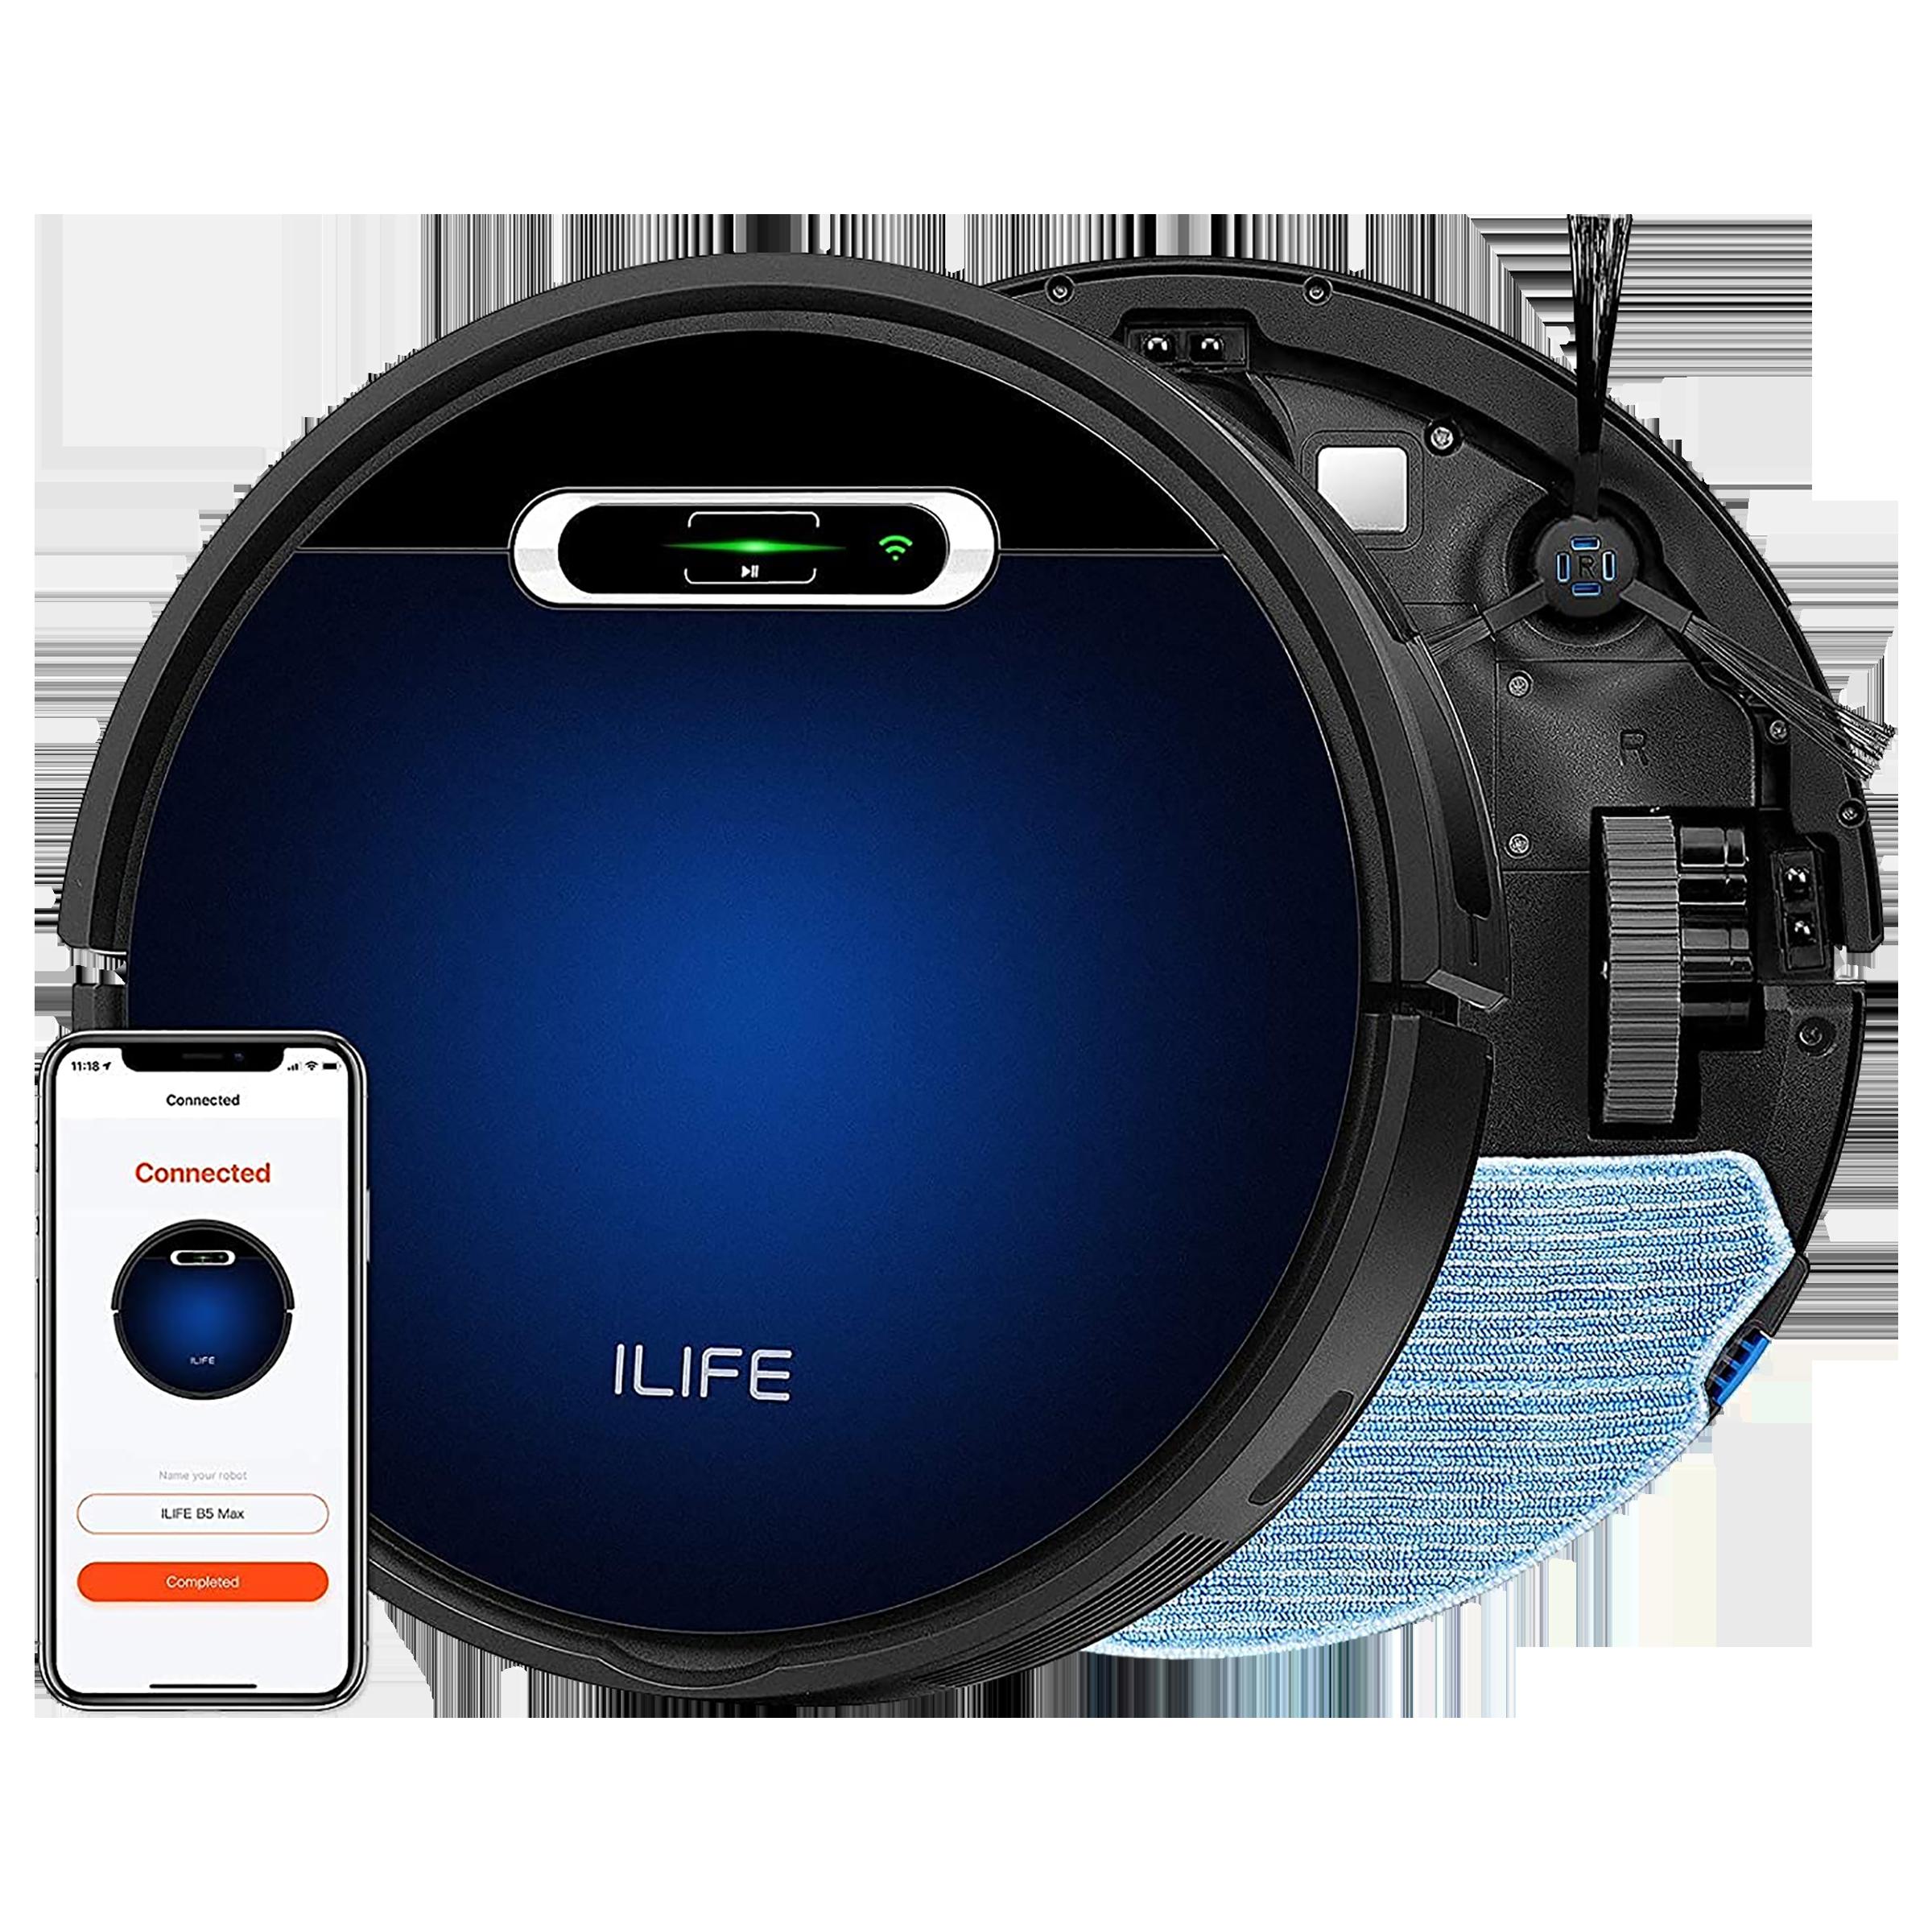 ILIFE 25 Watts Robotic Vacuum Cleaner (600ml, B5 Max, Blue)_1